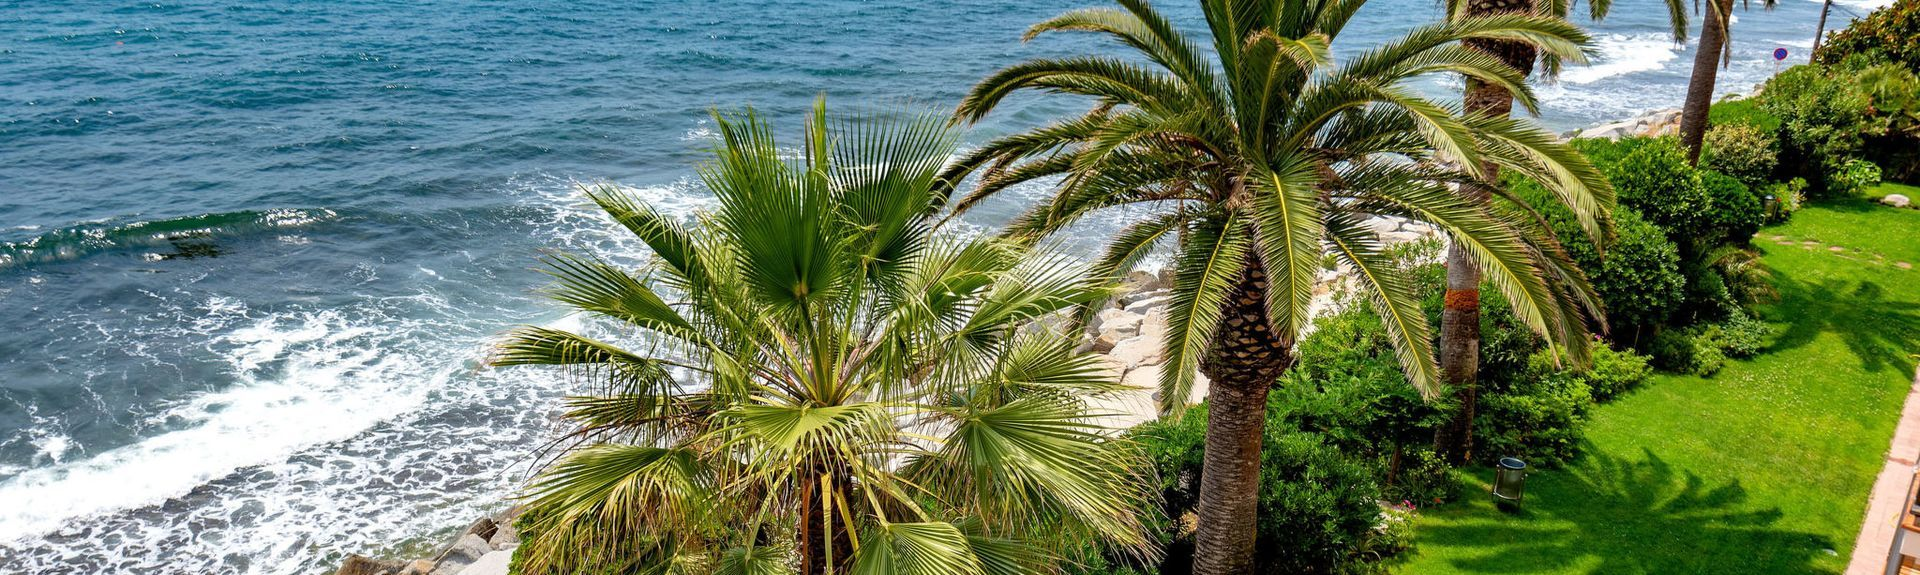 Calella Beach, Calella, Catalonia, Spain